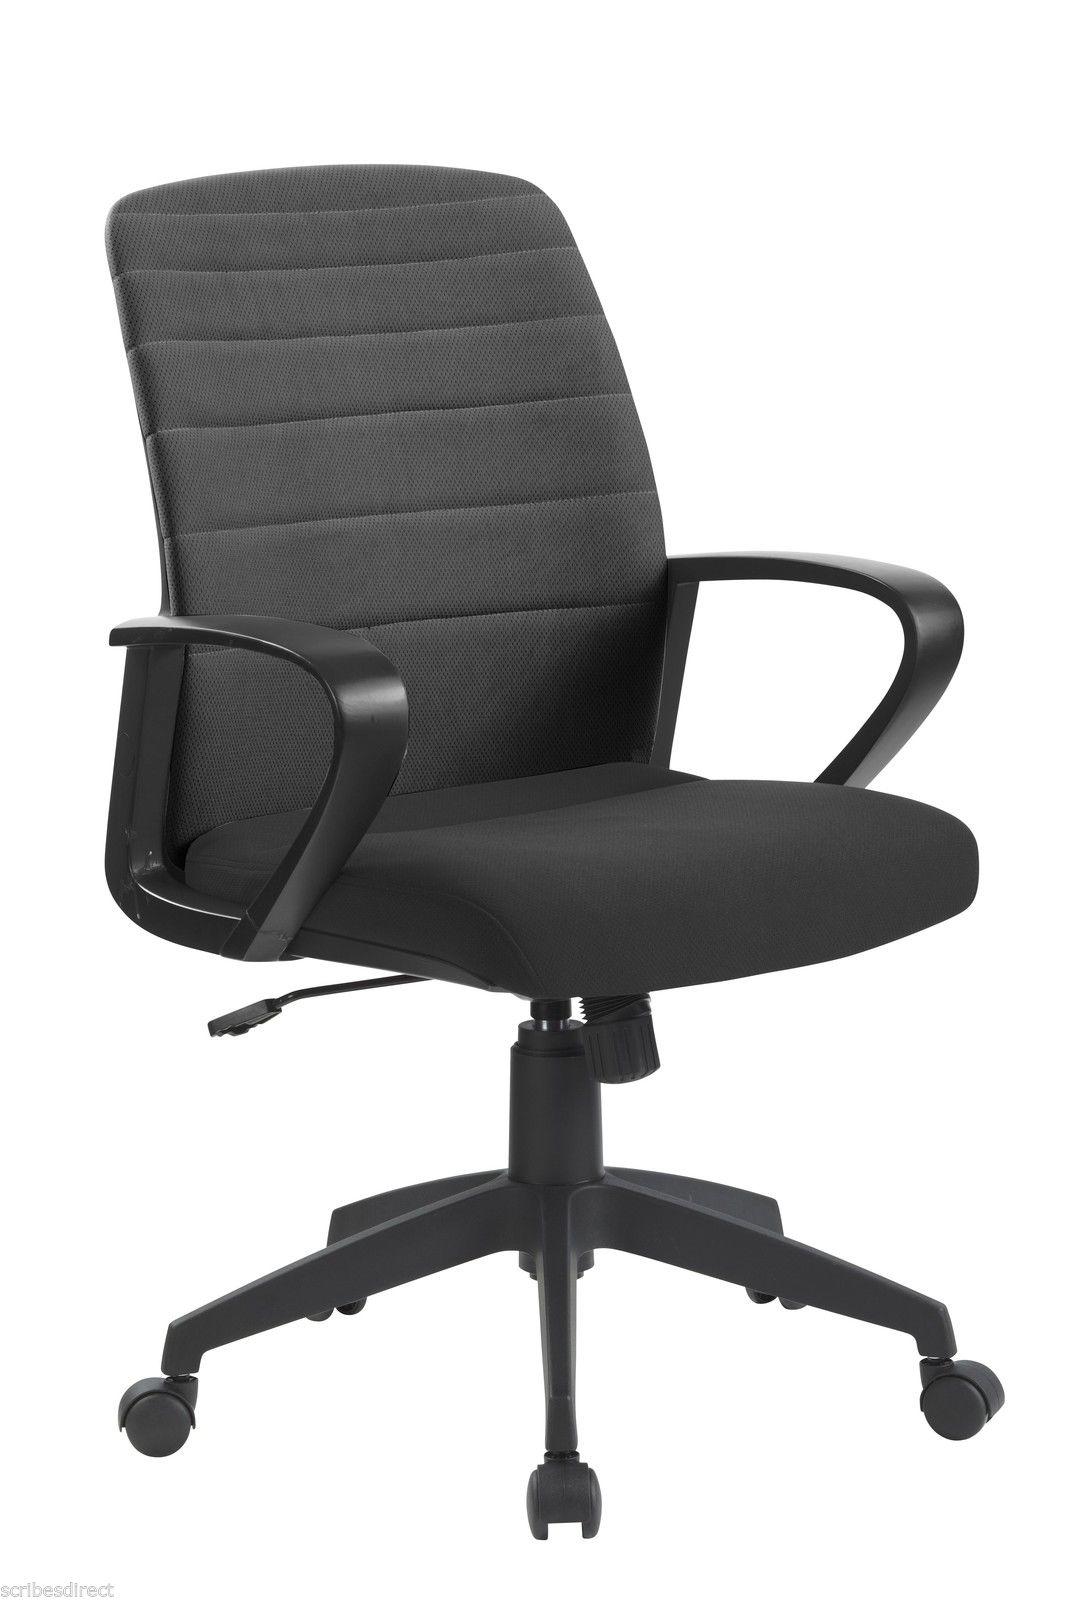 OYSTER Folding Designer Operator fice puter Swivel Task Chair in BLACK